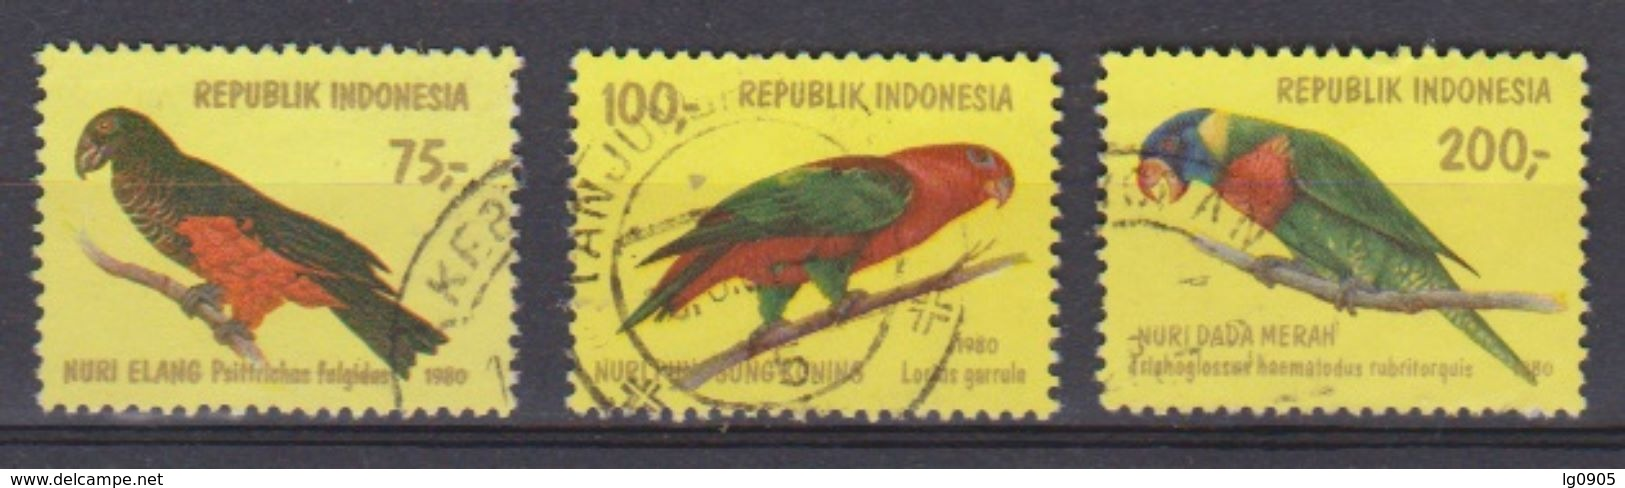 Indonesie Indonesia 1022-1024 Used ;  Papegaai, Perroquet, Perruche, Parrakeet, Parots, Papagayo, Cotorra, 1980 - Papegaaien, Parkieten